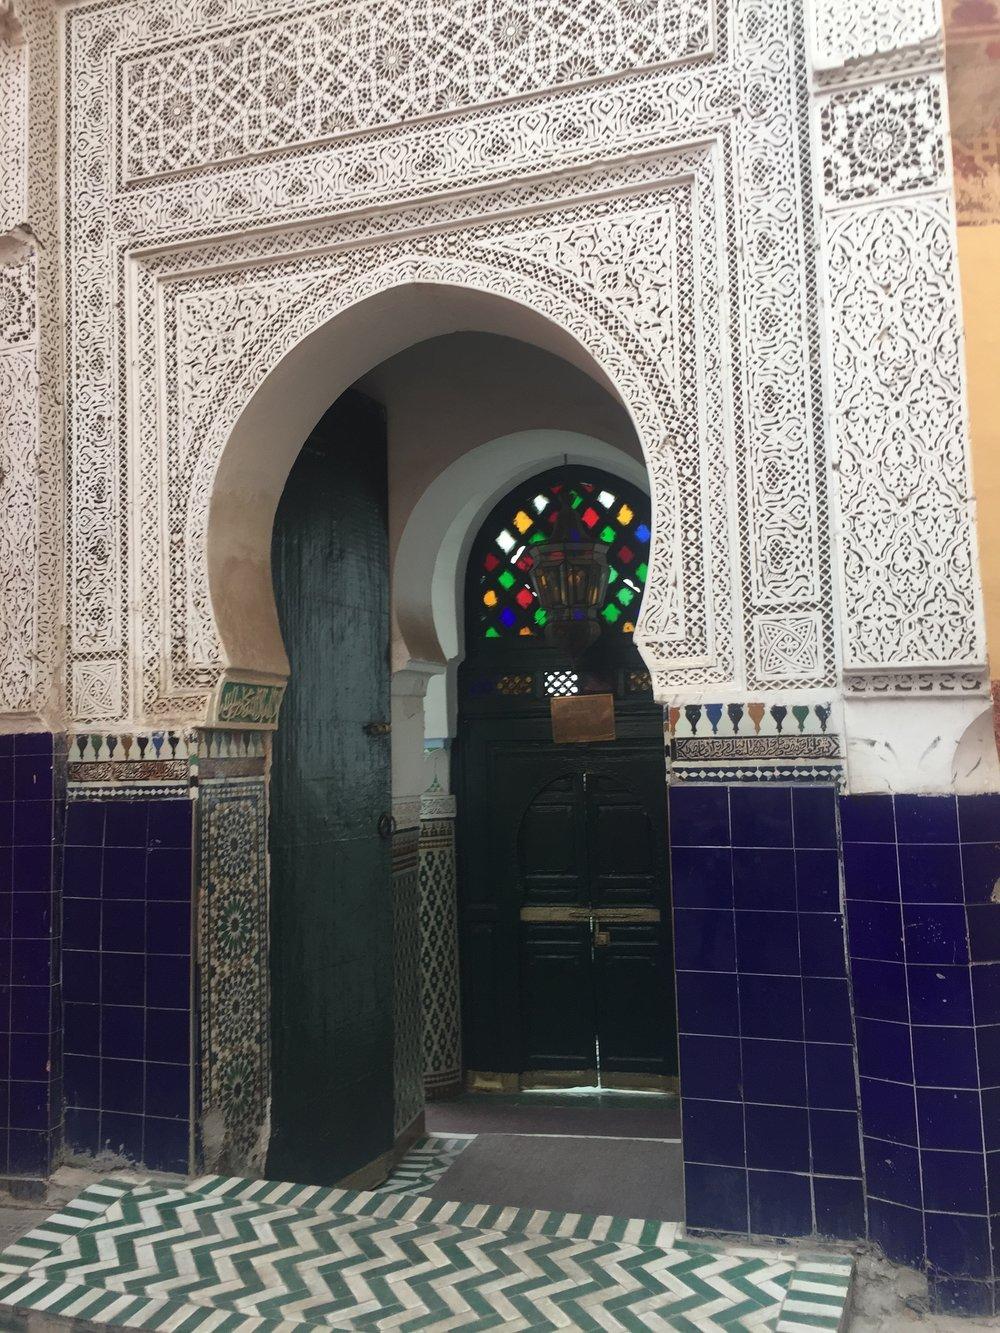 An entrance to a mosque (Non-Muslims weren't allowed inside